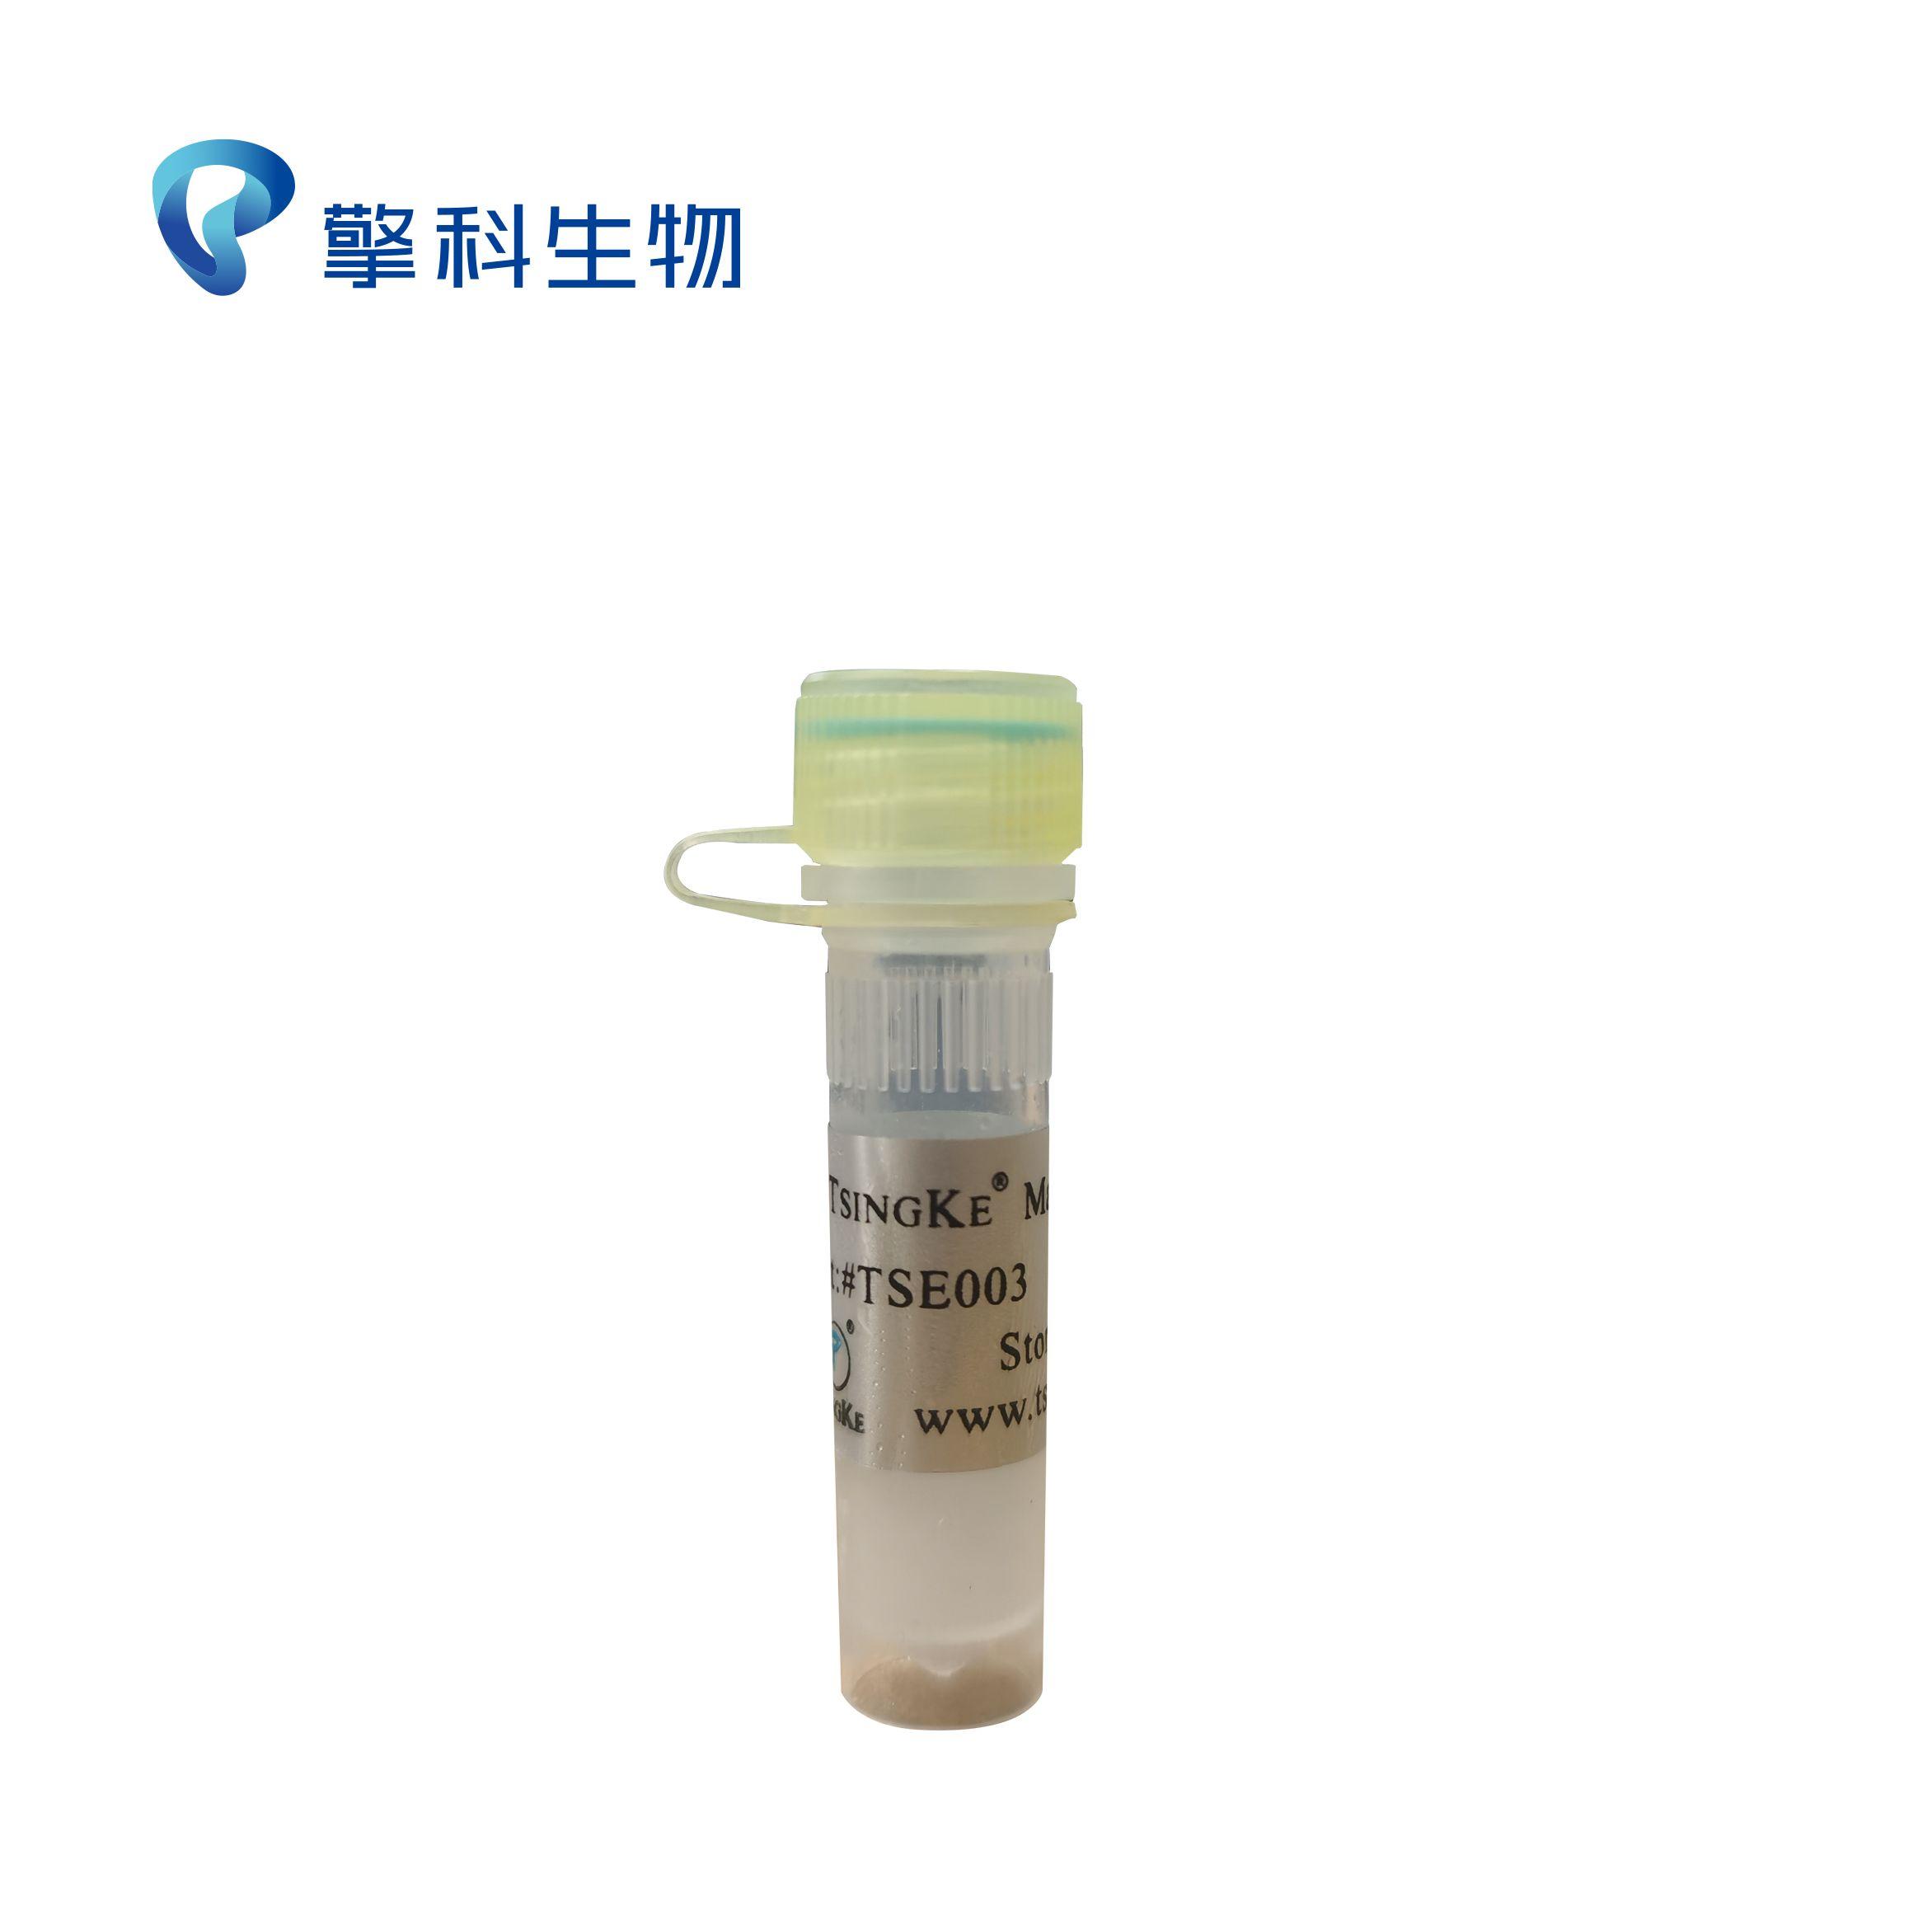 2×TSINGKE Master Mix/热启动酶、高灵敏度、高产量、适用于多重PCR、无色mix/擎科生物TSINGKE